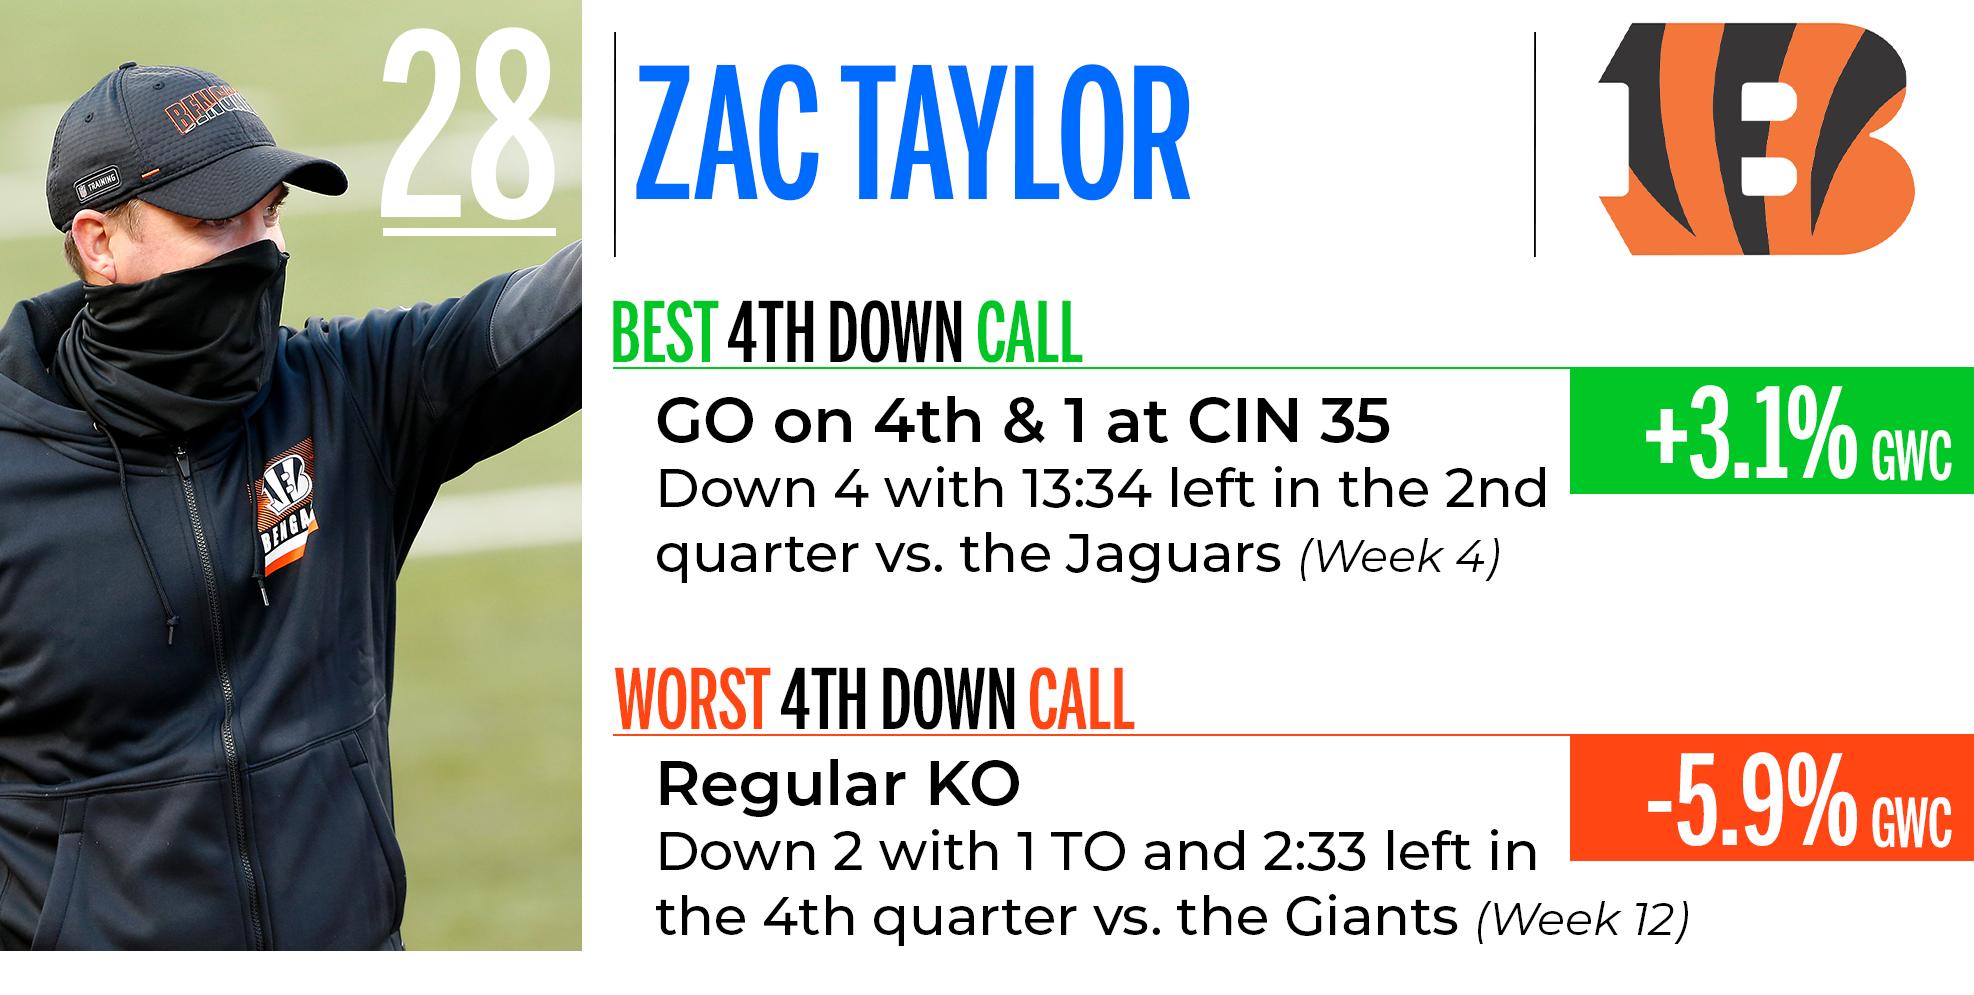 Zac Taylor